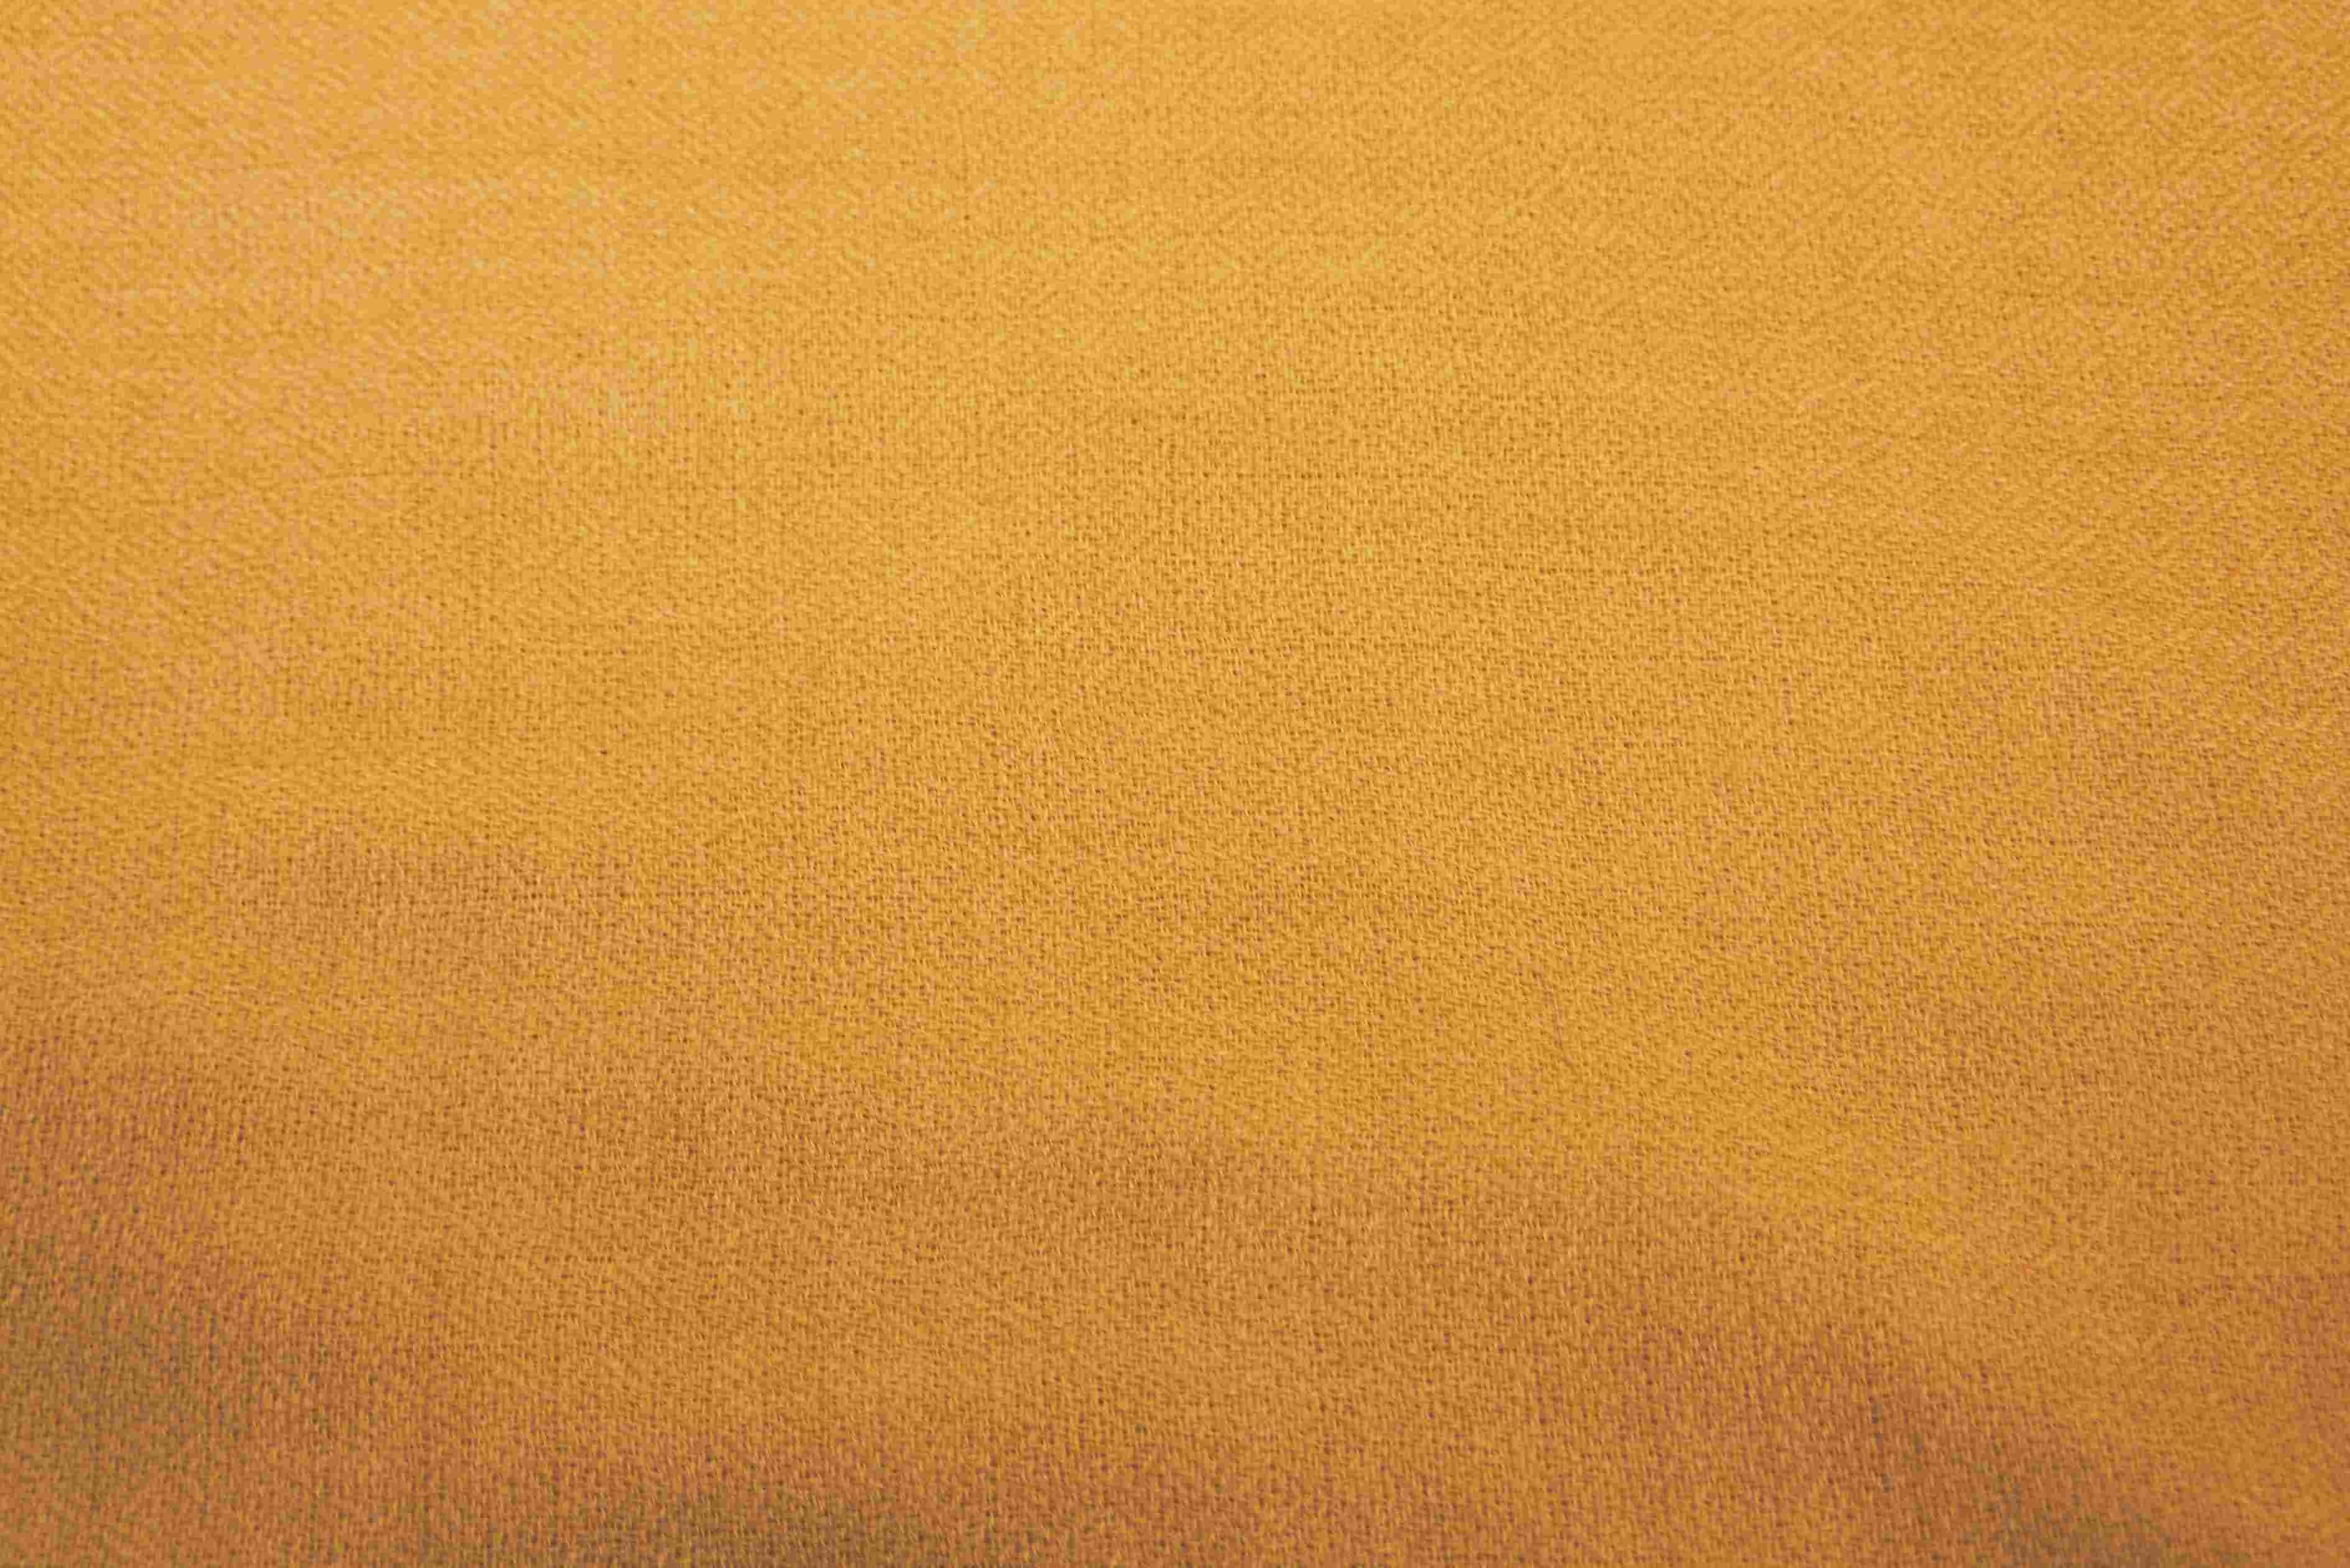 Fine Cashmere Scarf Karakoram Birds-Eye Weave Peach  by Pashmina & Silk